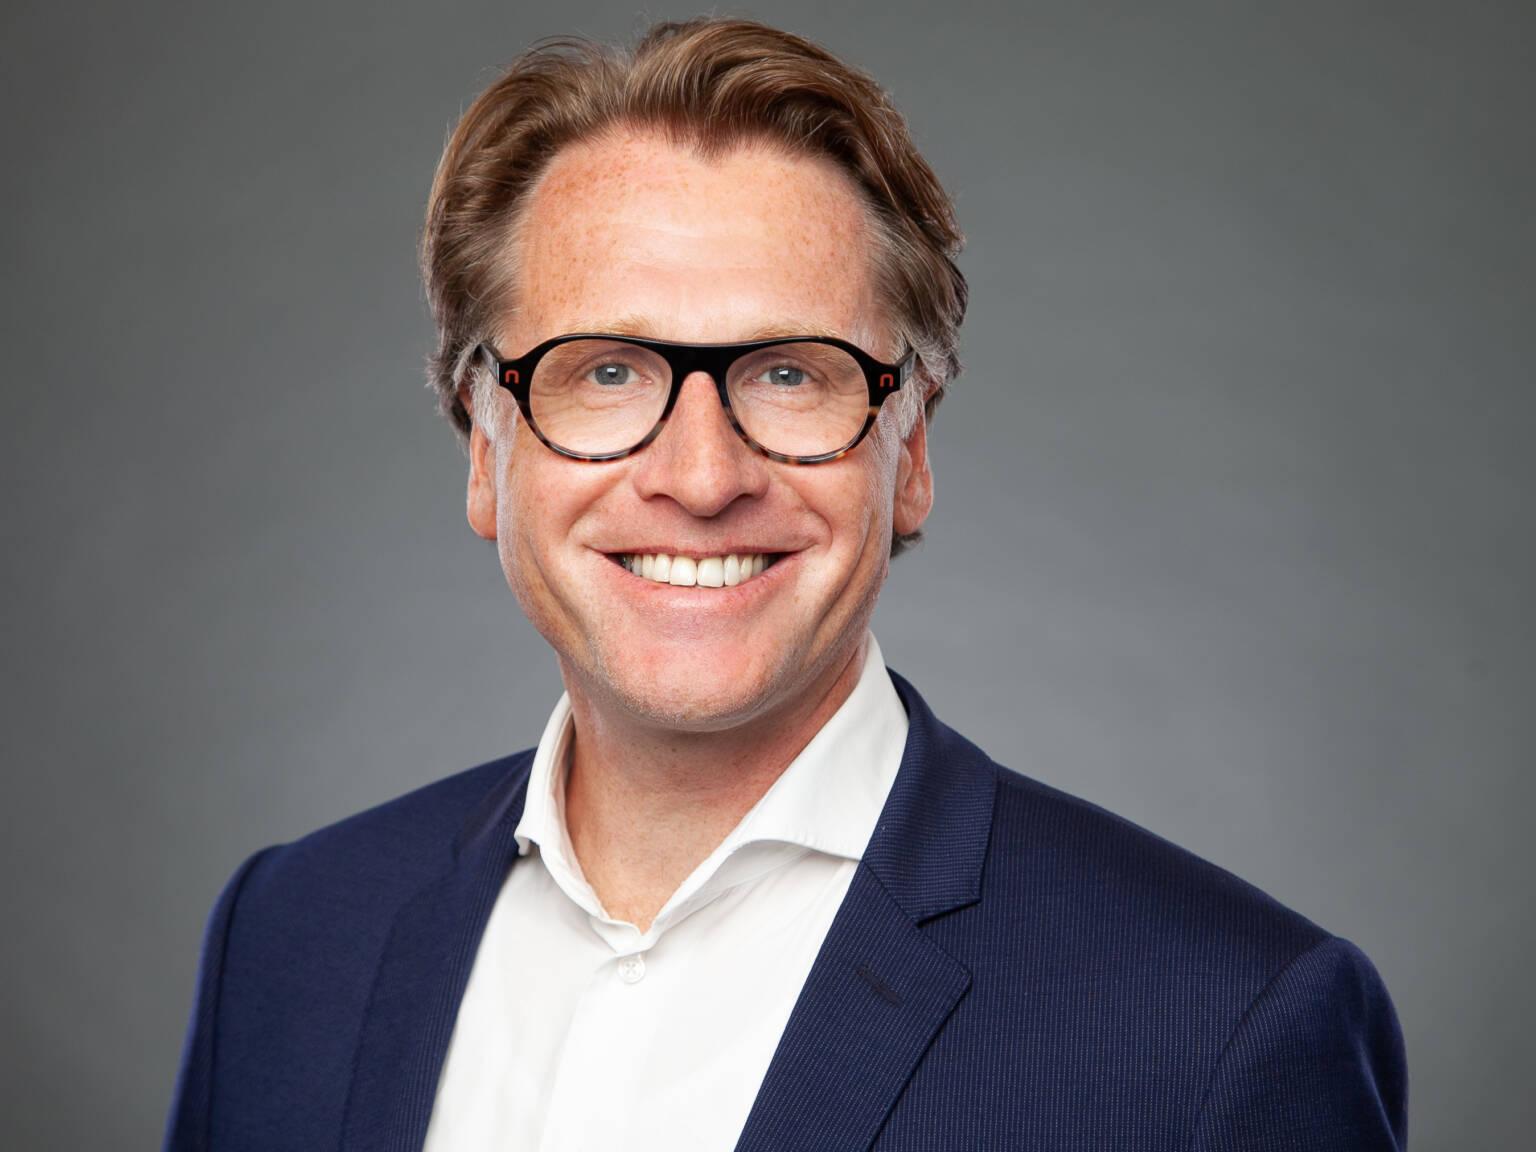 Olaf Bock, Geschäftsführer